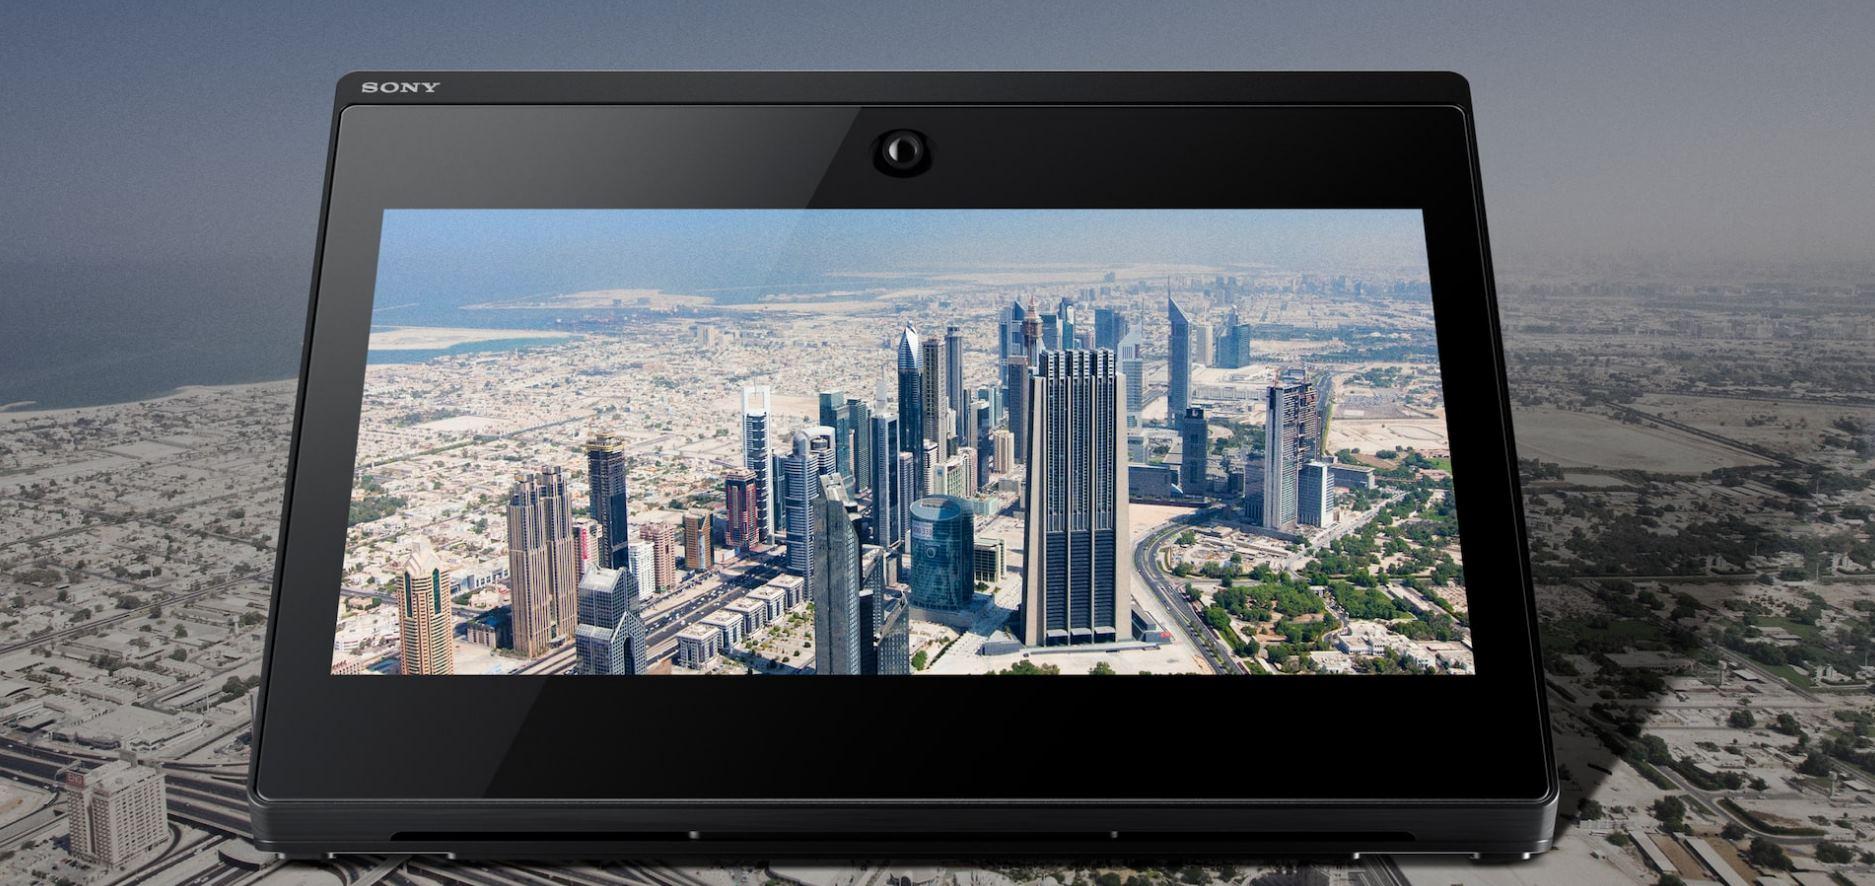 Sony presenta pantalla para ver objetos en 3D